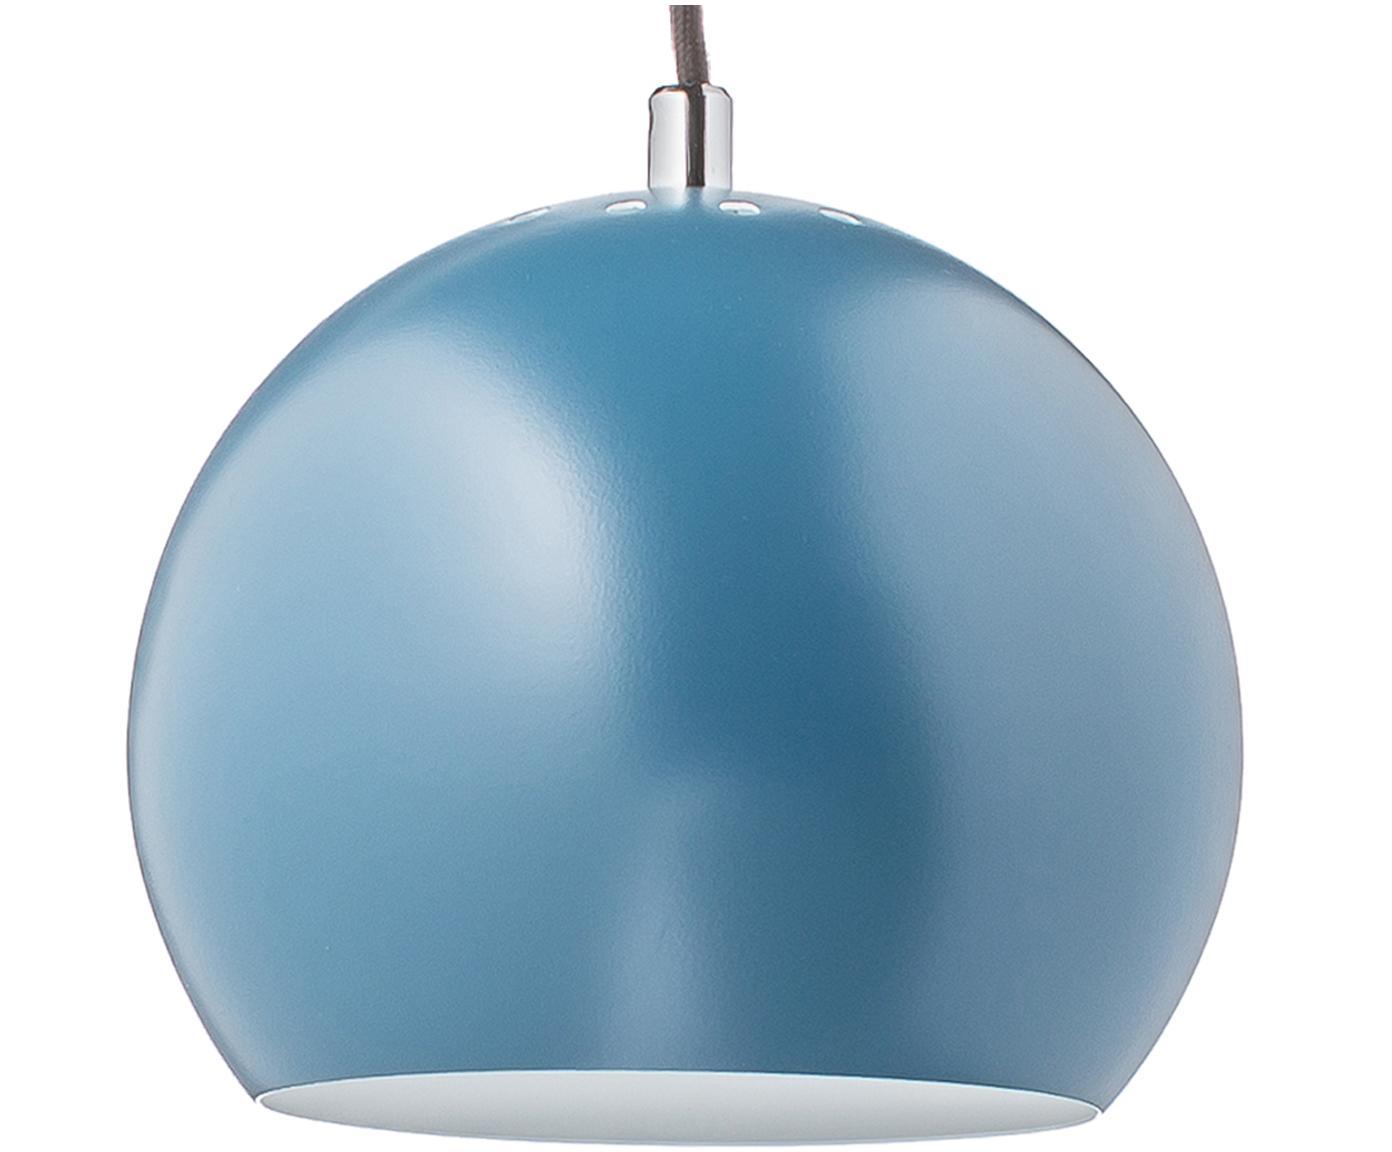 Kleine Kugel-Pendelleuchte Ball, Metall, pulverbeschichtet, Petrol, Ø 18 x H 16 cm